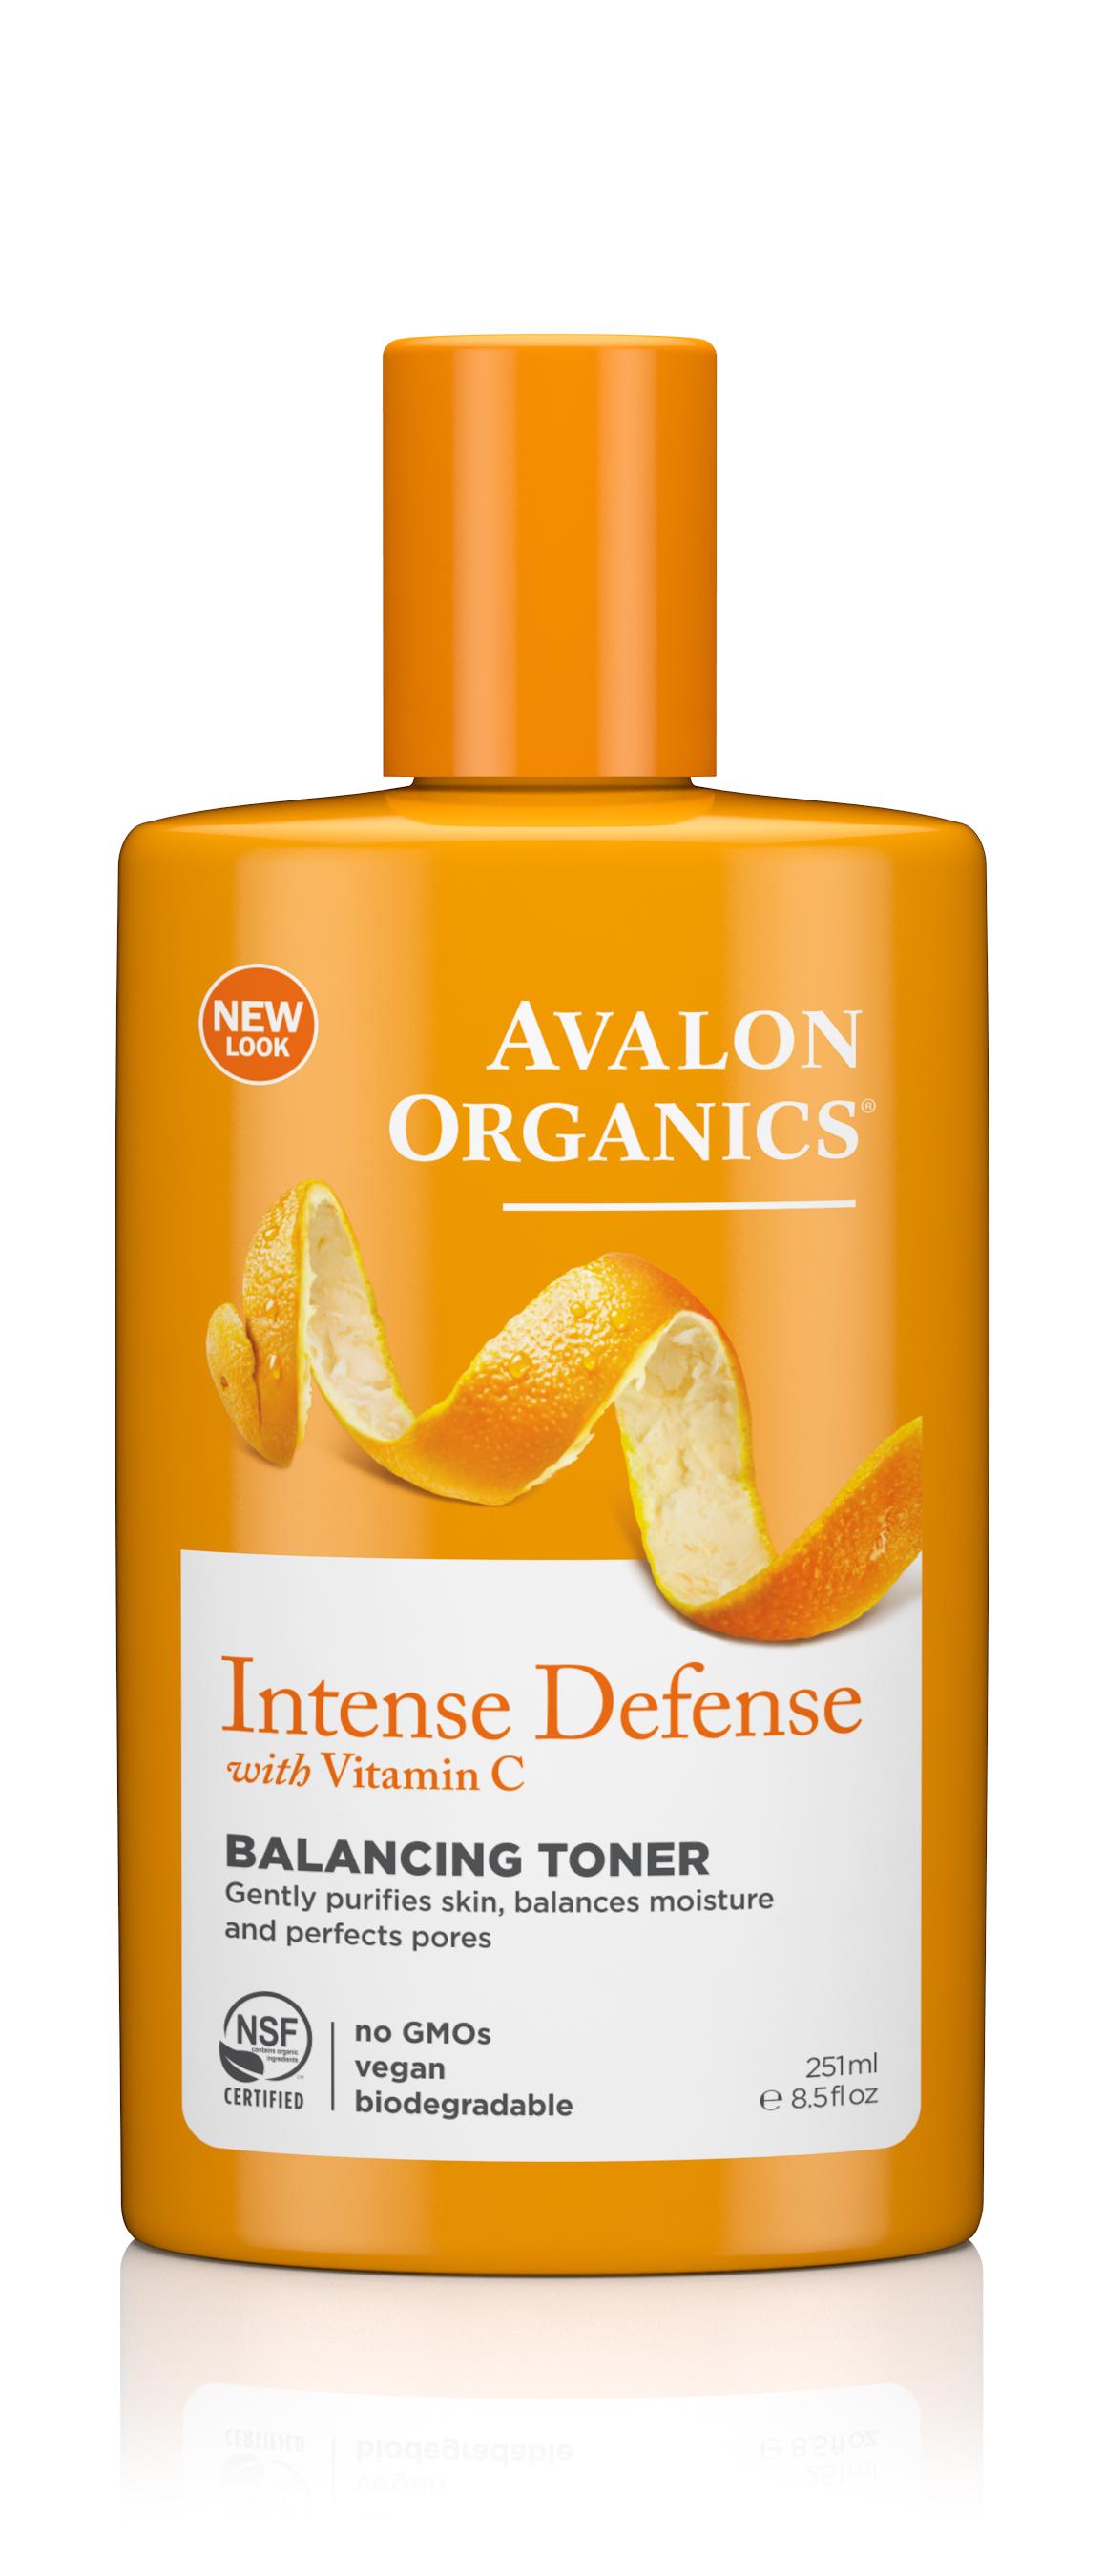 Avalon Organics Vitamin C Renewal Toner